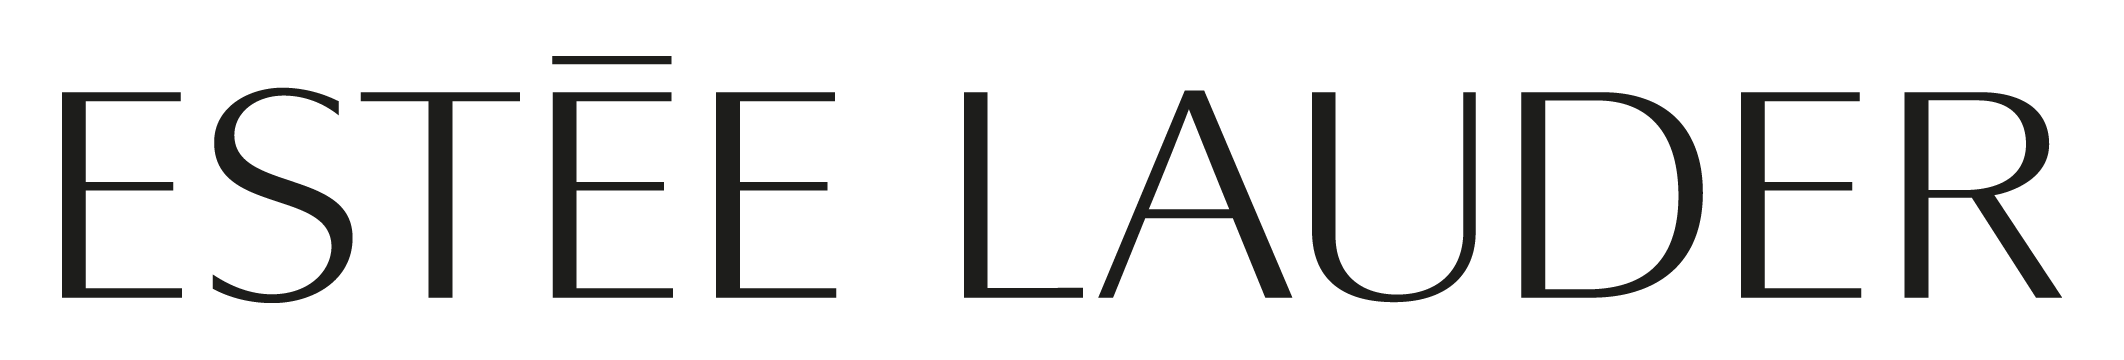 Estee Lauder Logo PNG Transparent.